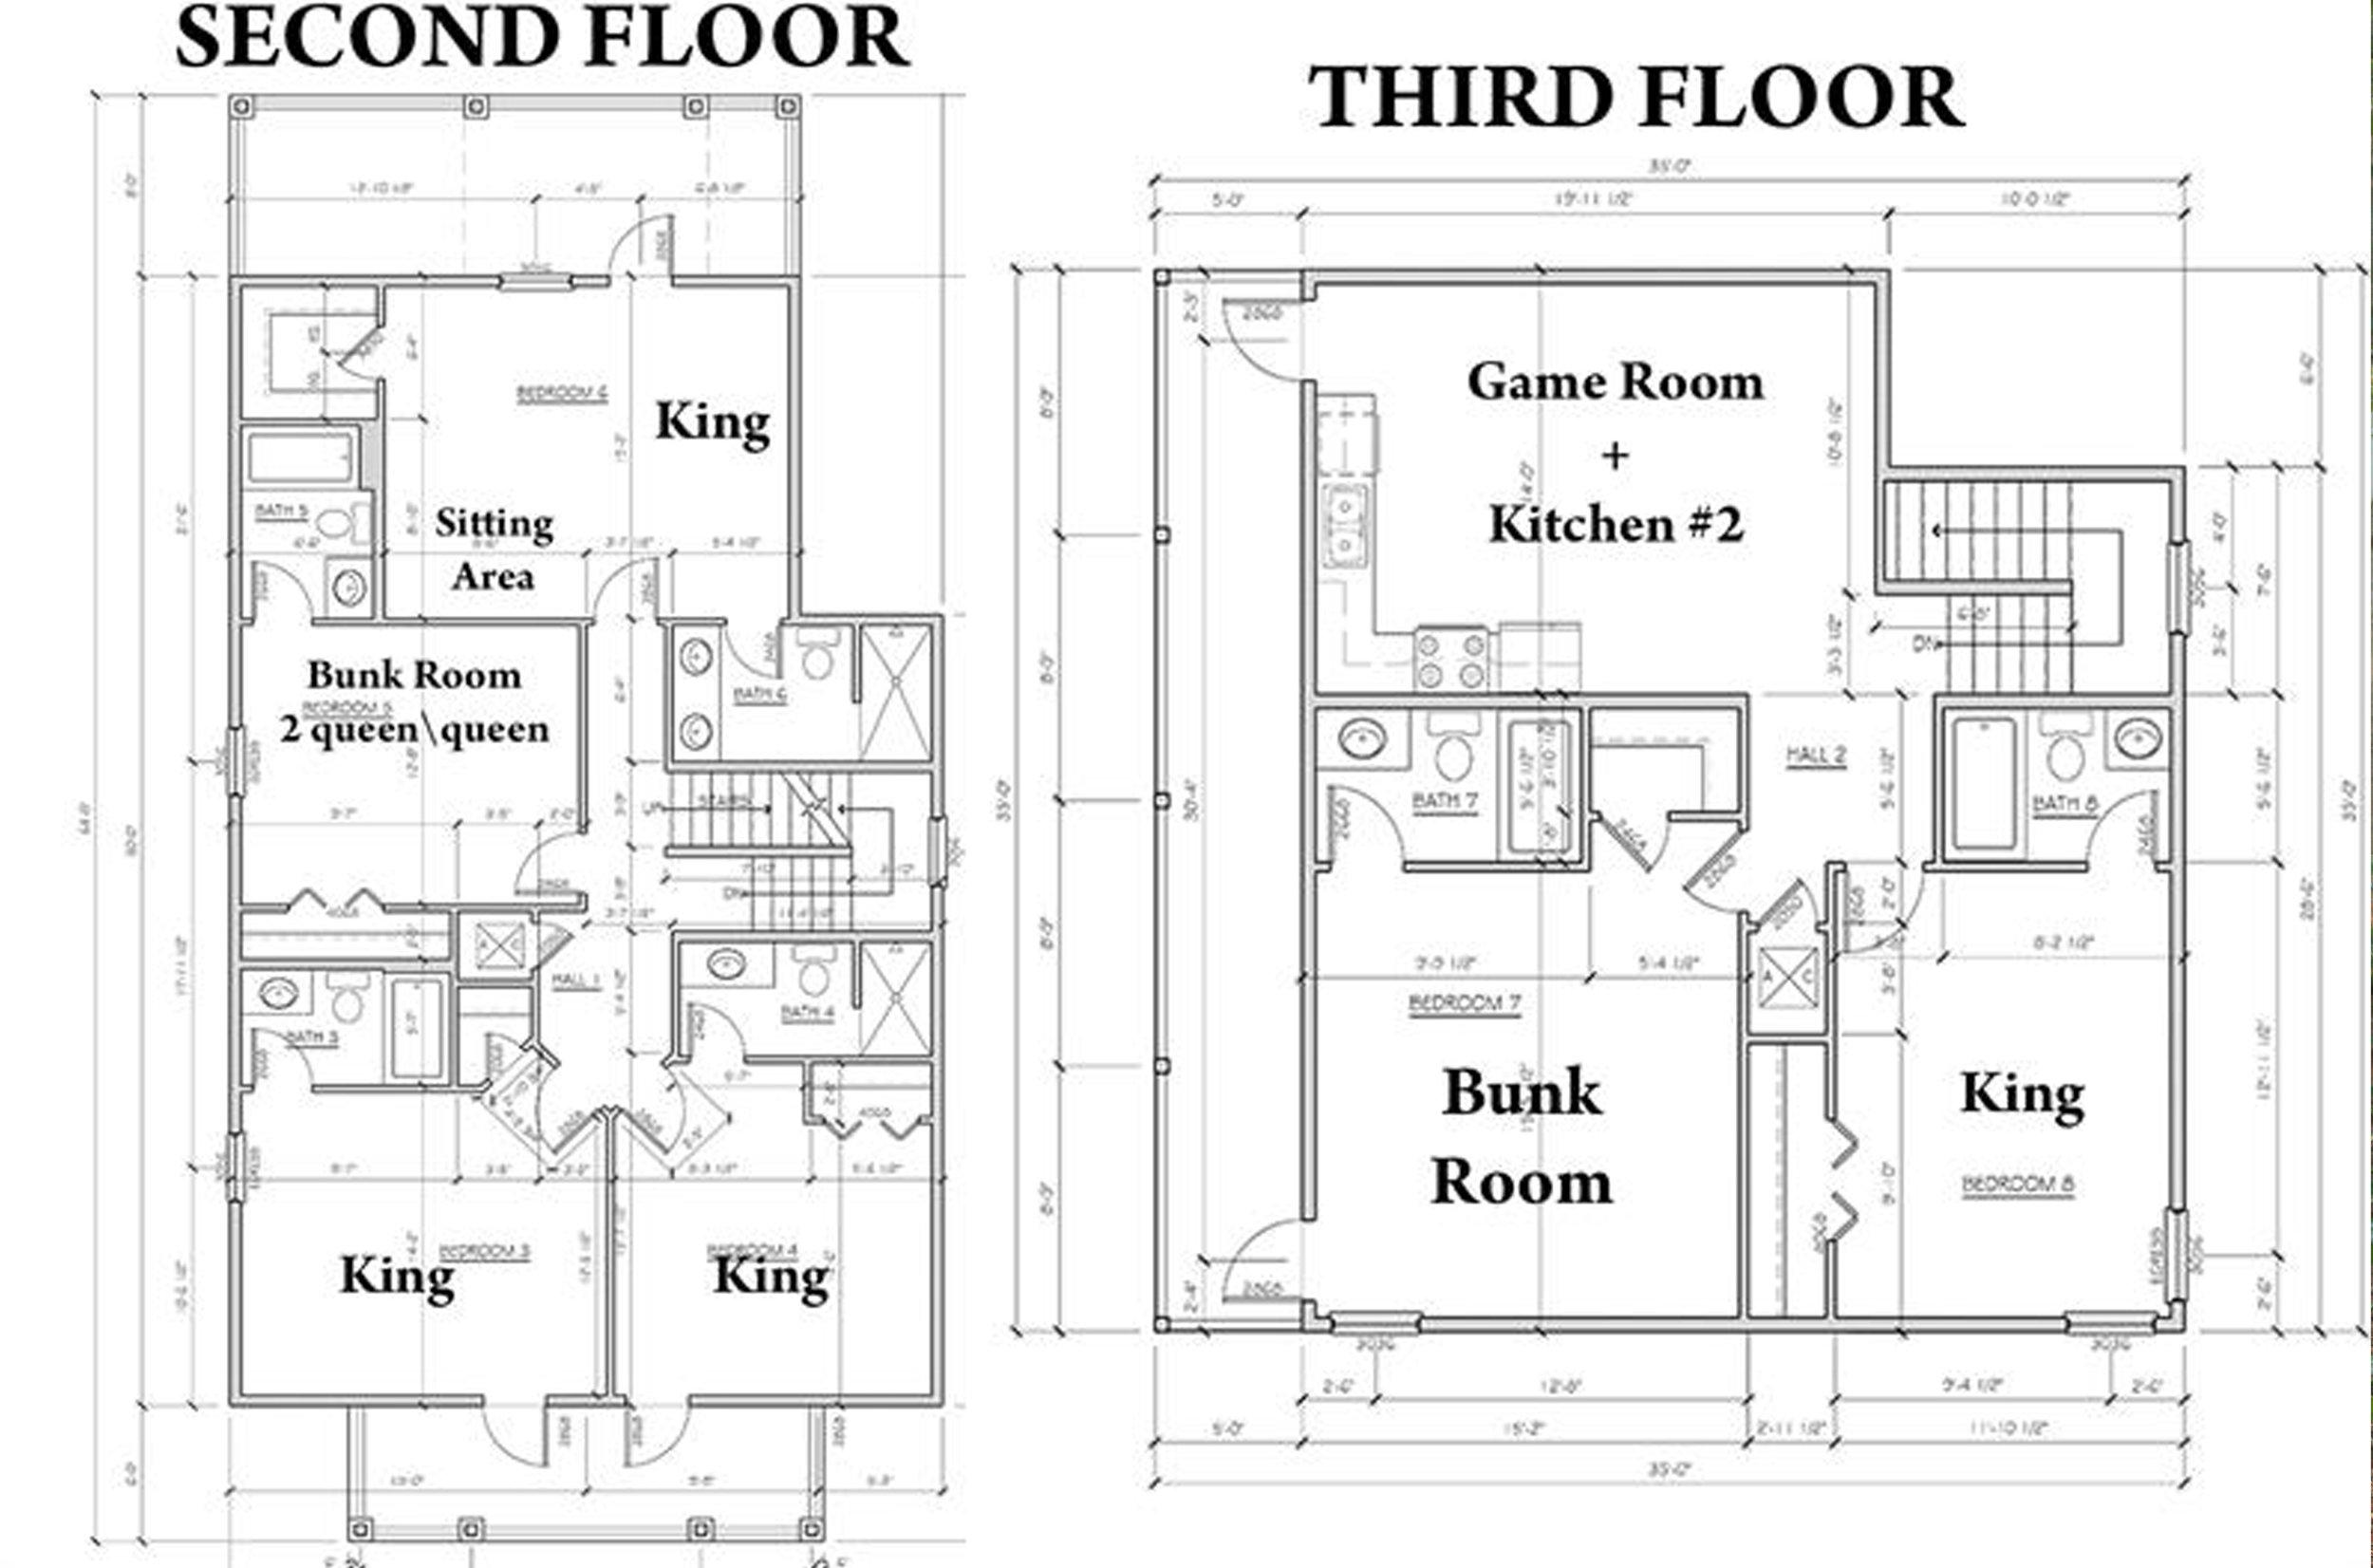 Second & Third Floor Layout Blueprint